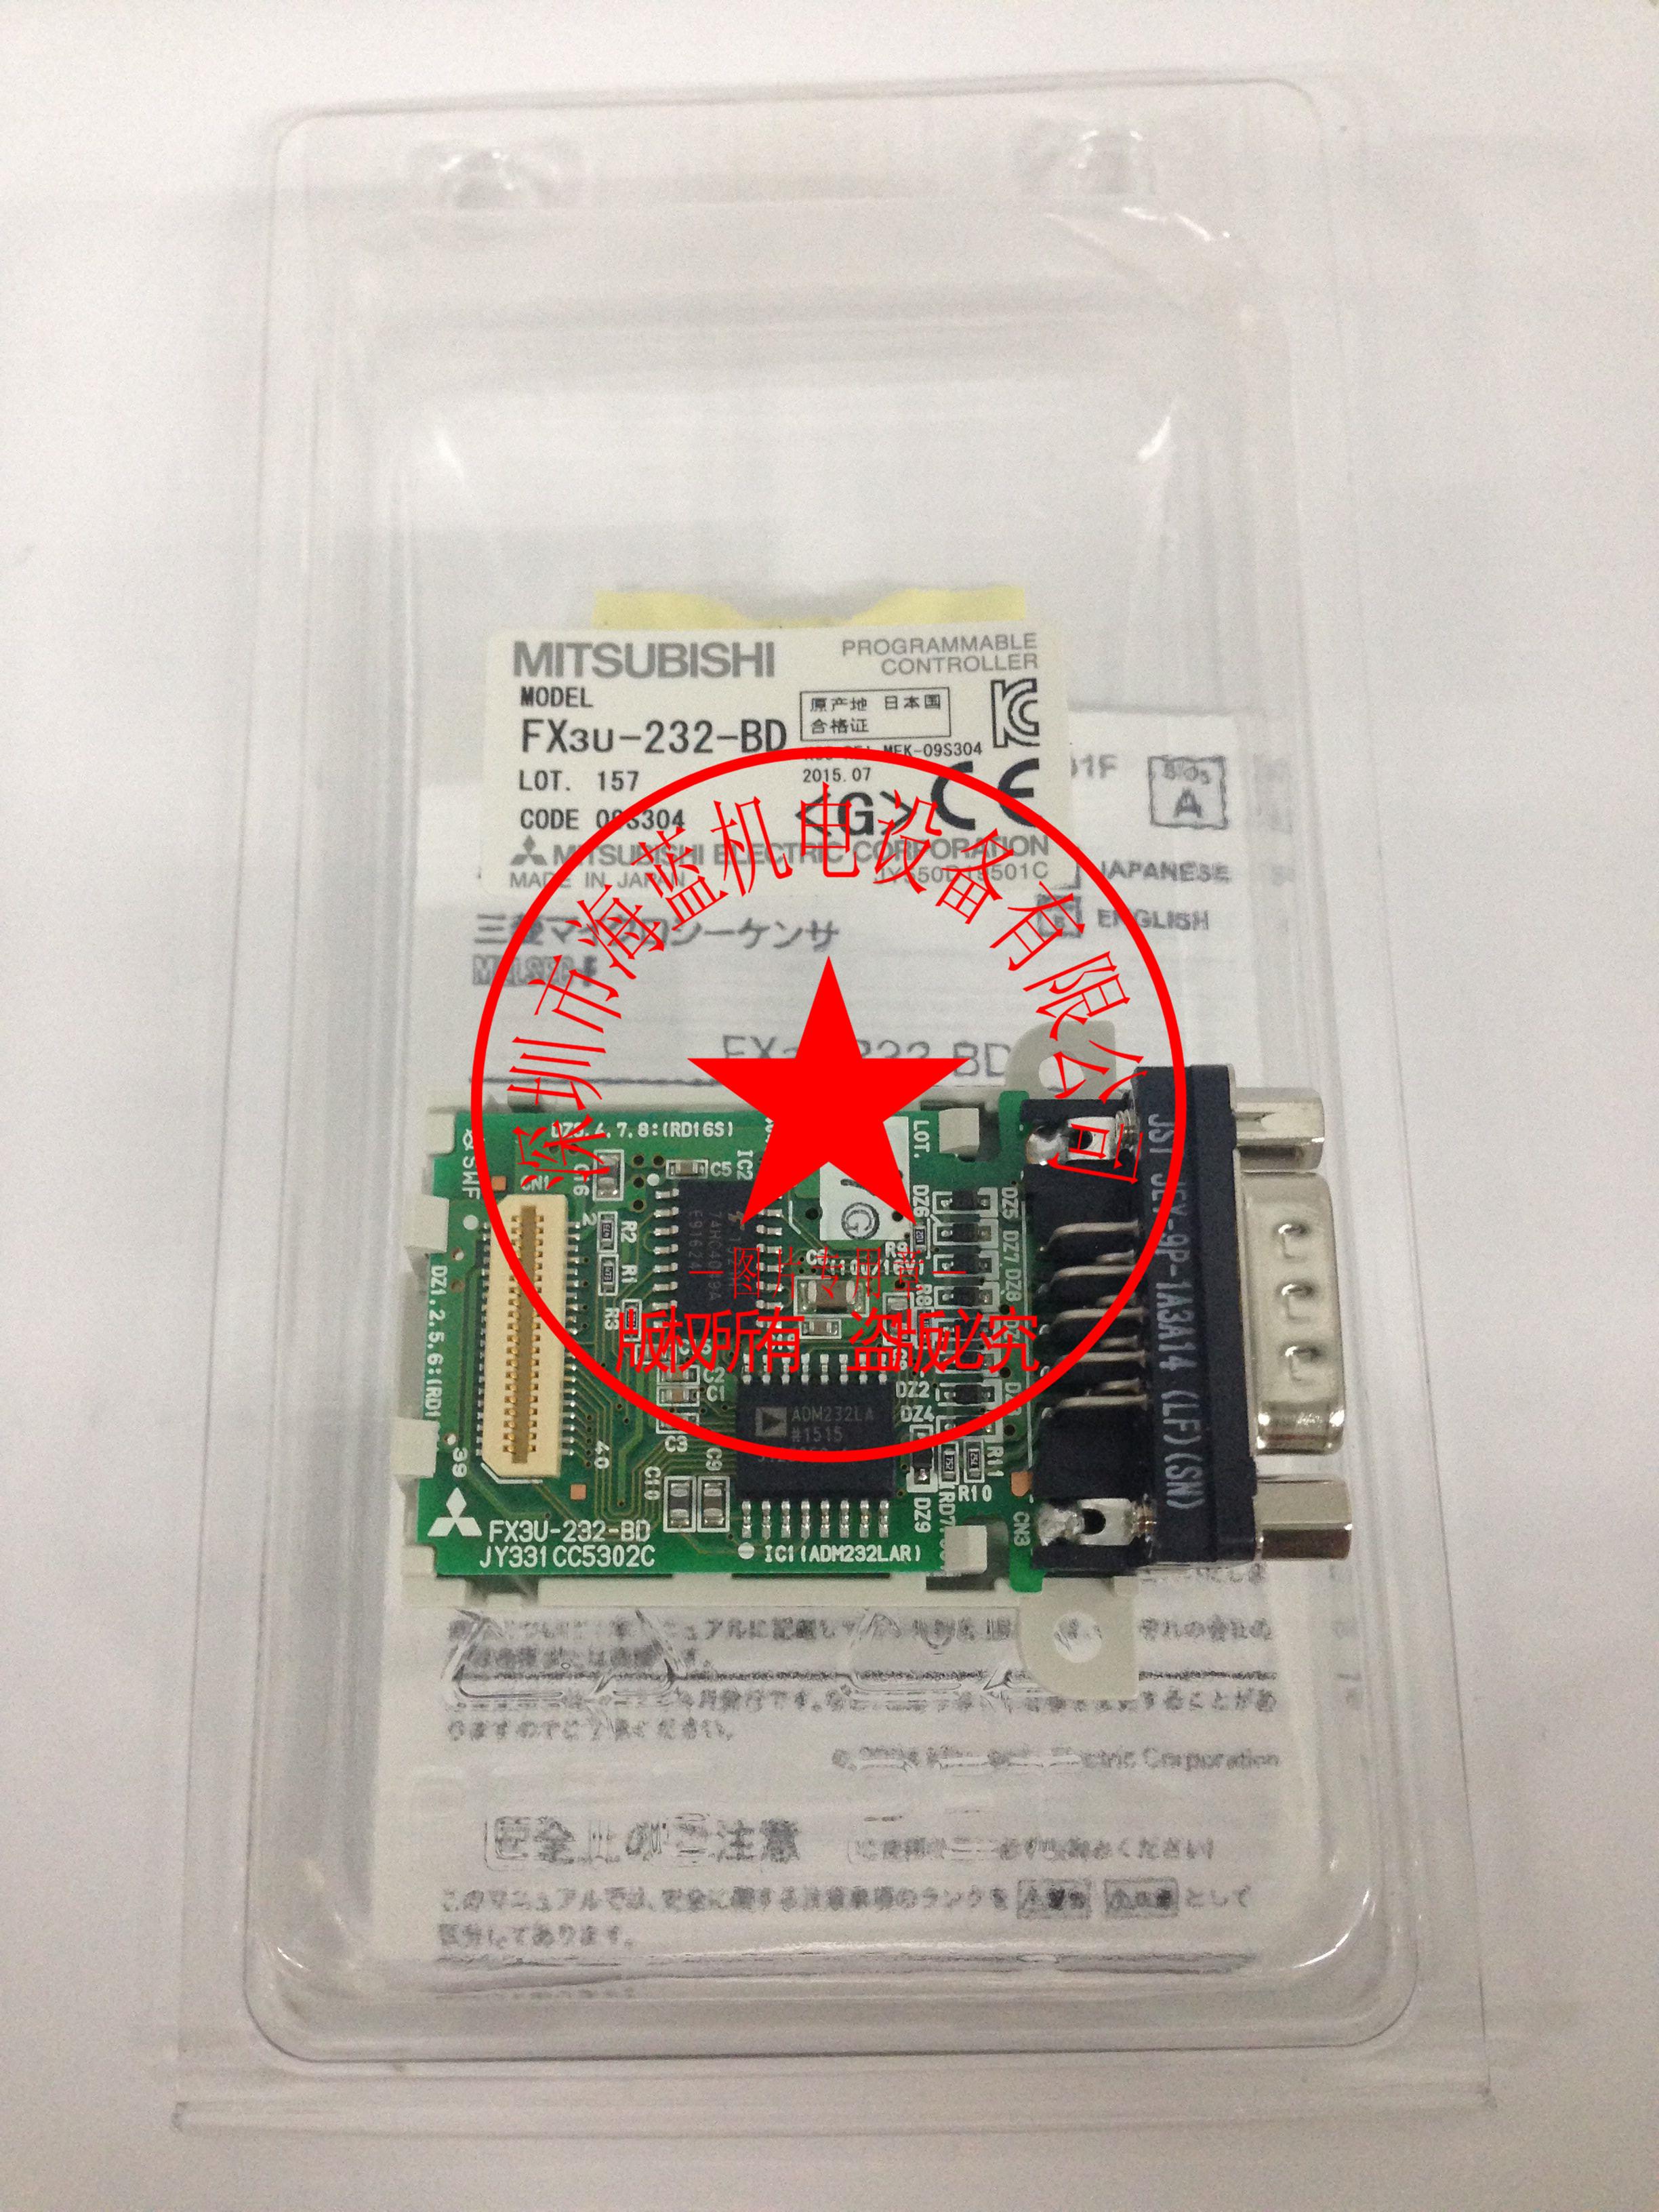 fx3u-232-bd|三菱原装plc模块|fx3u系列通讯模块|100%